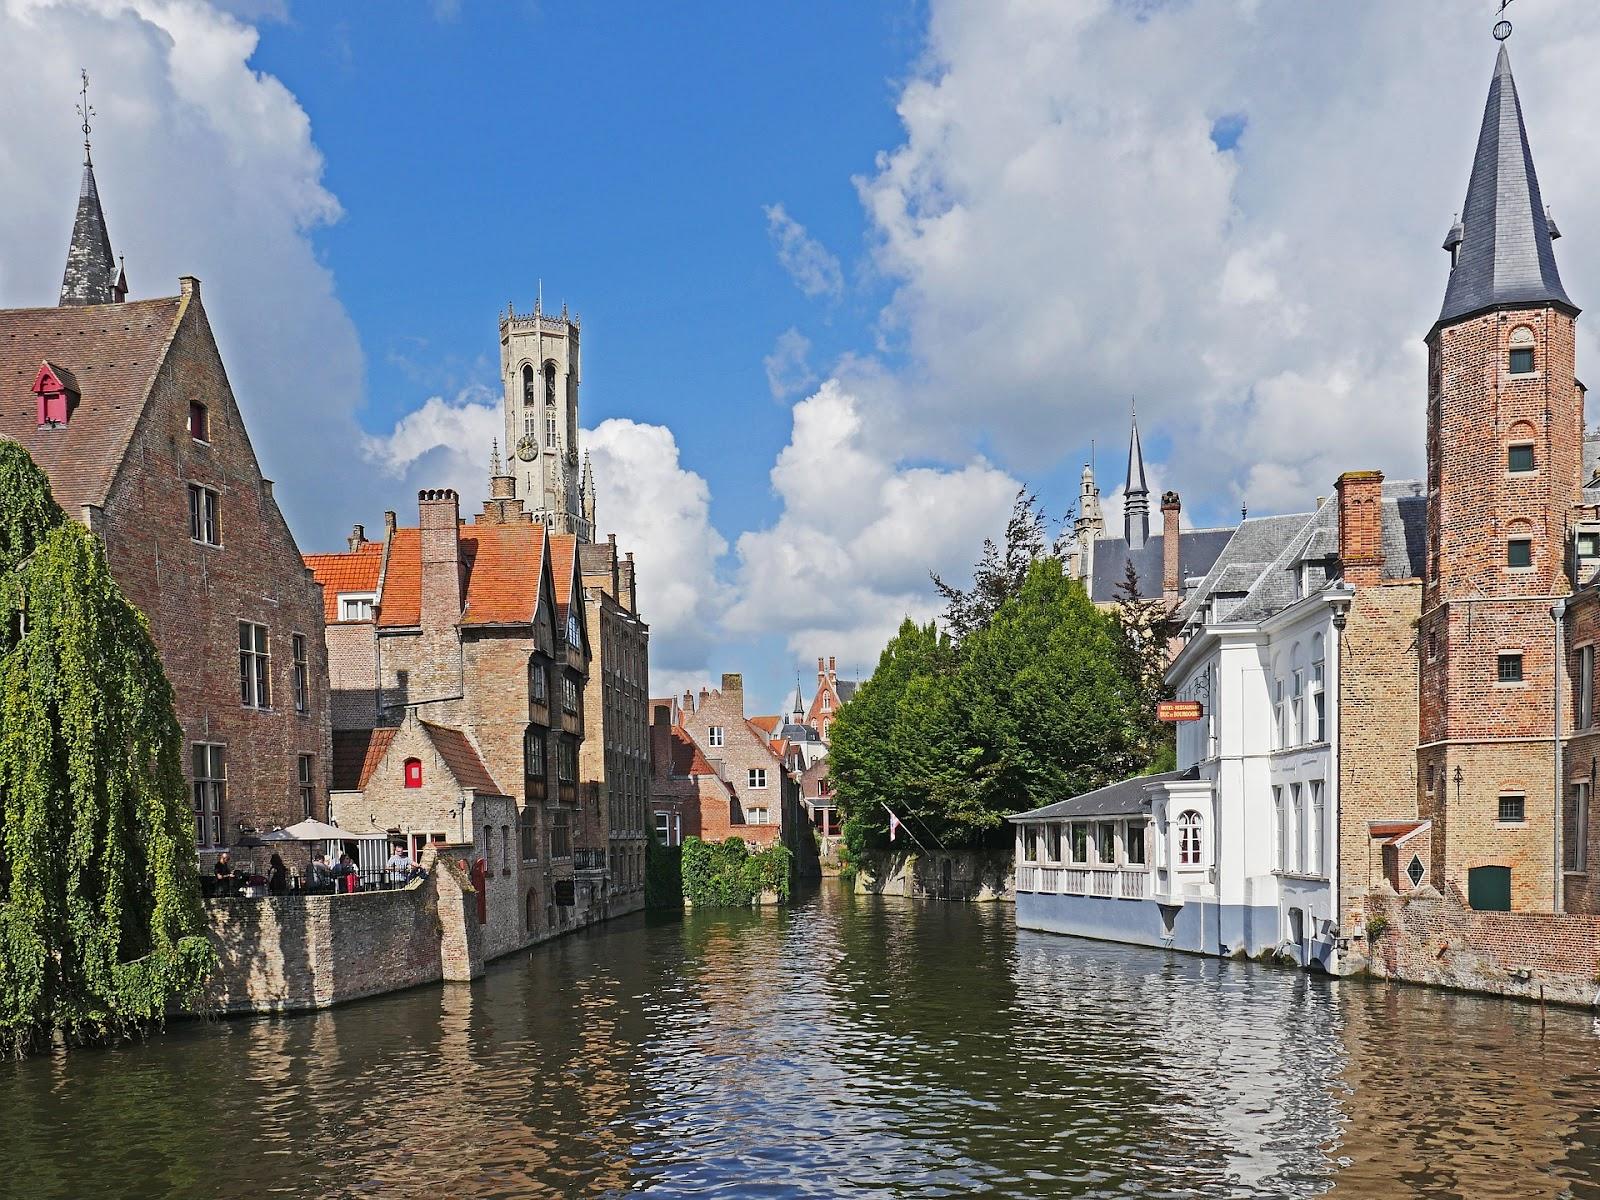 canal-in-bruges-2724438_1920.jpg